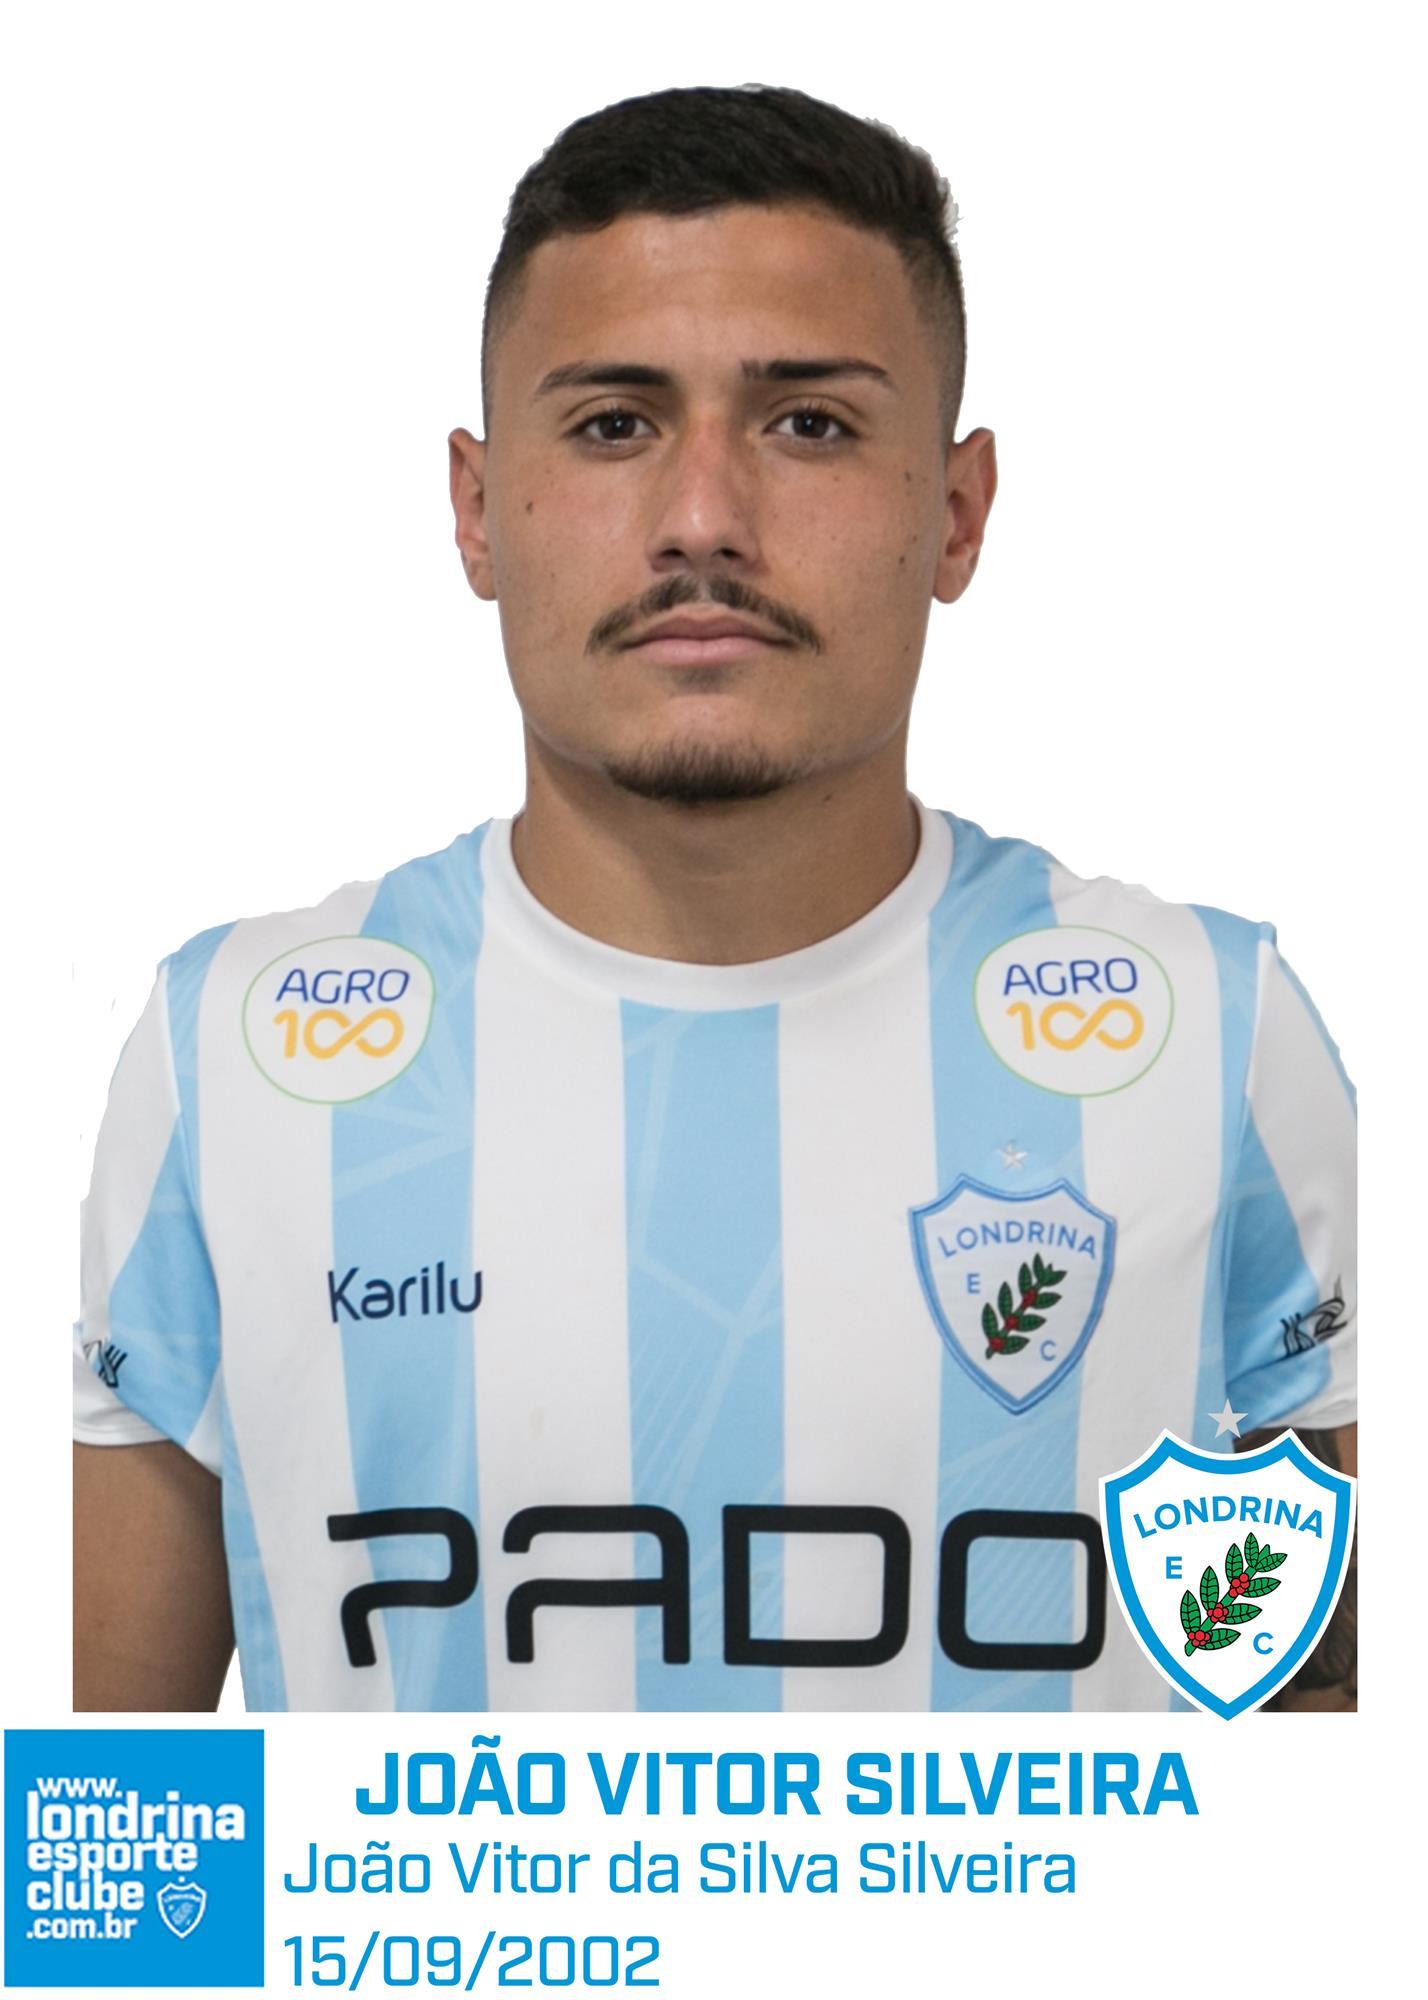 João Vitor Silveira